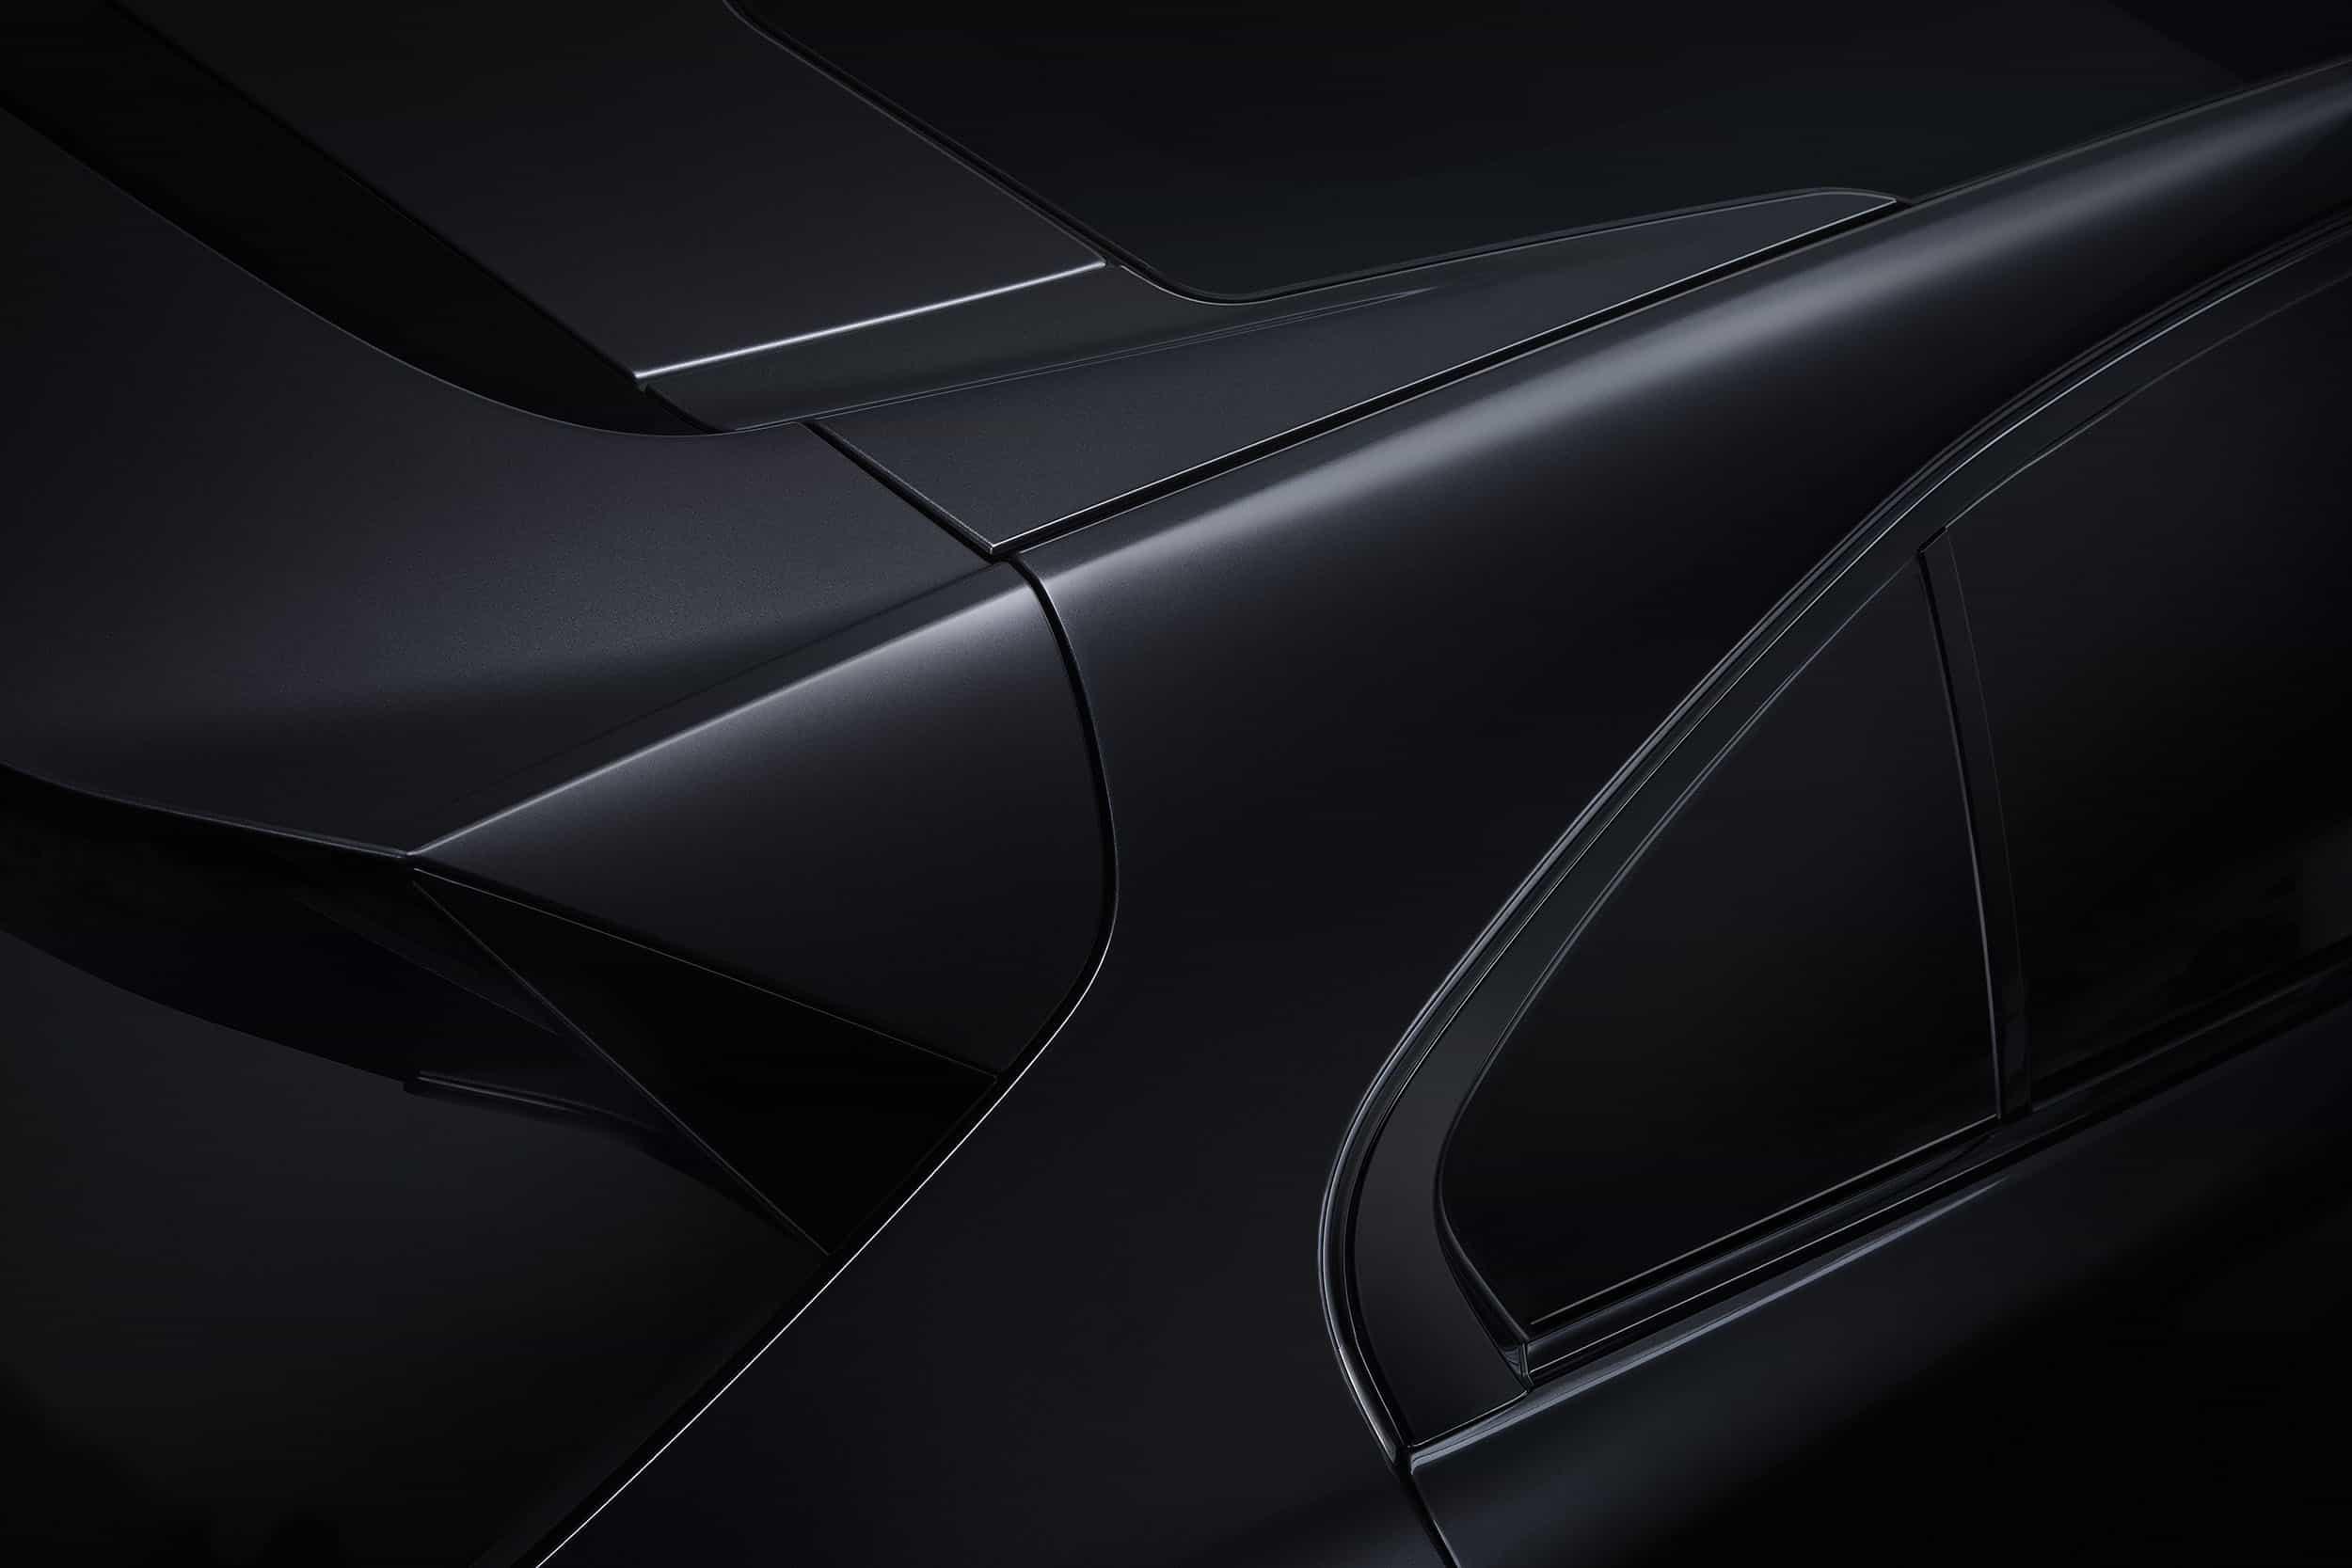 studio-ignatov-wkw-automotive-imagekampagne-bw-02